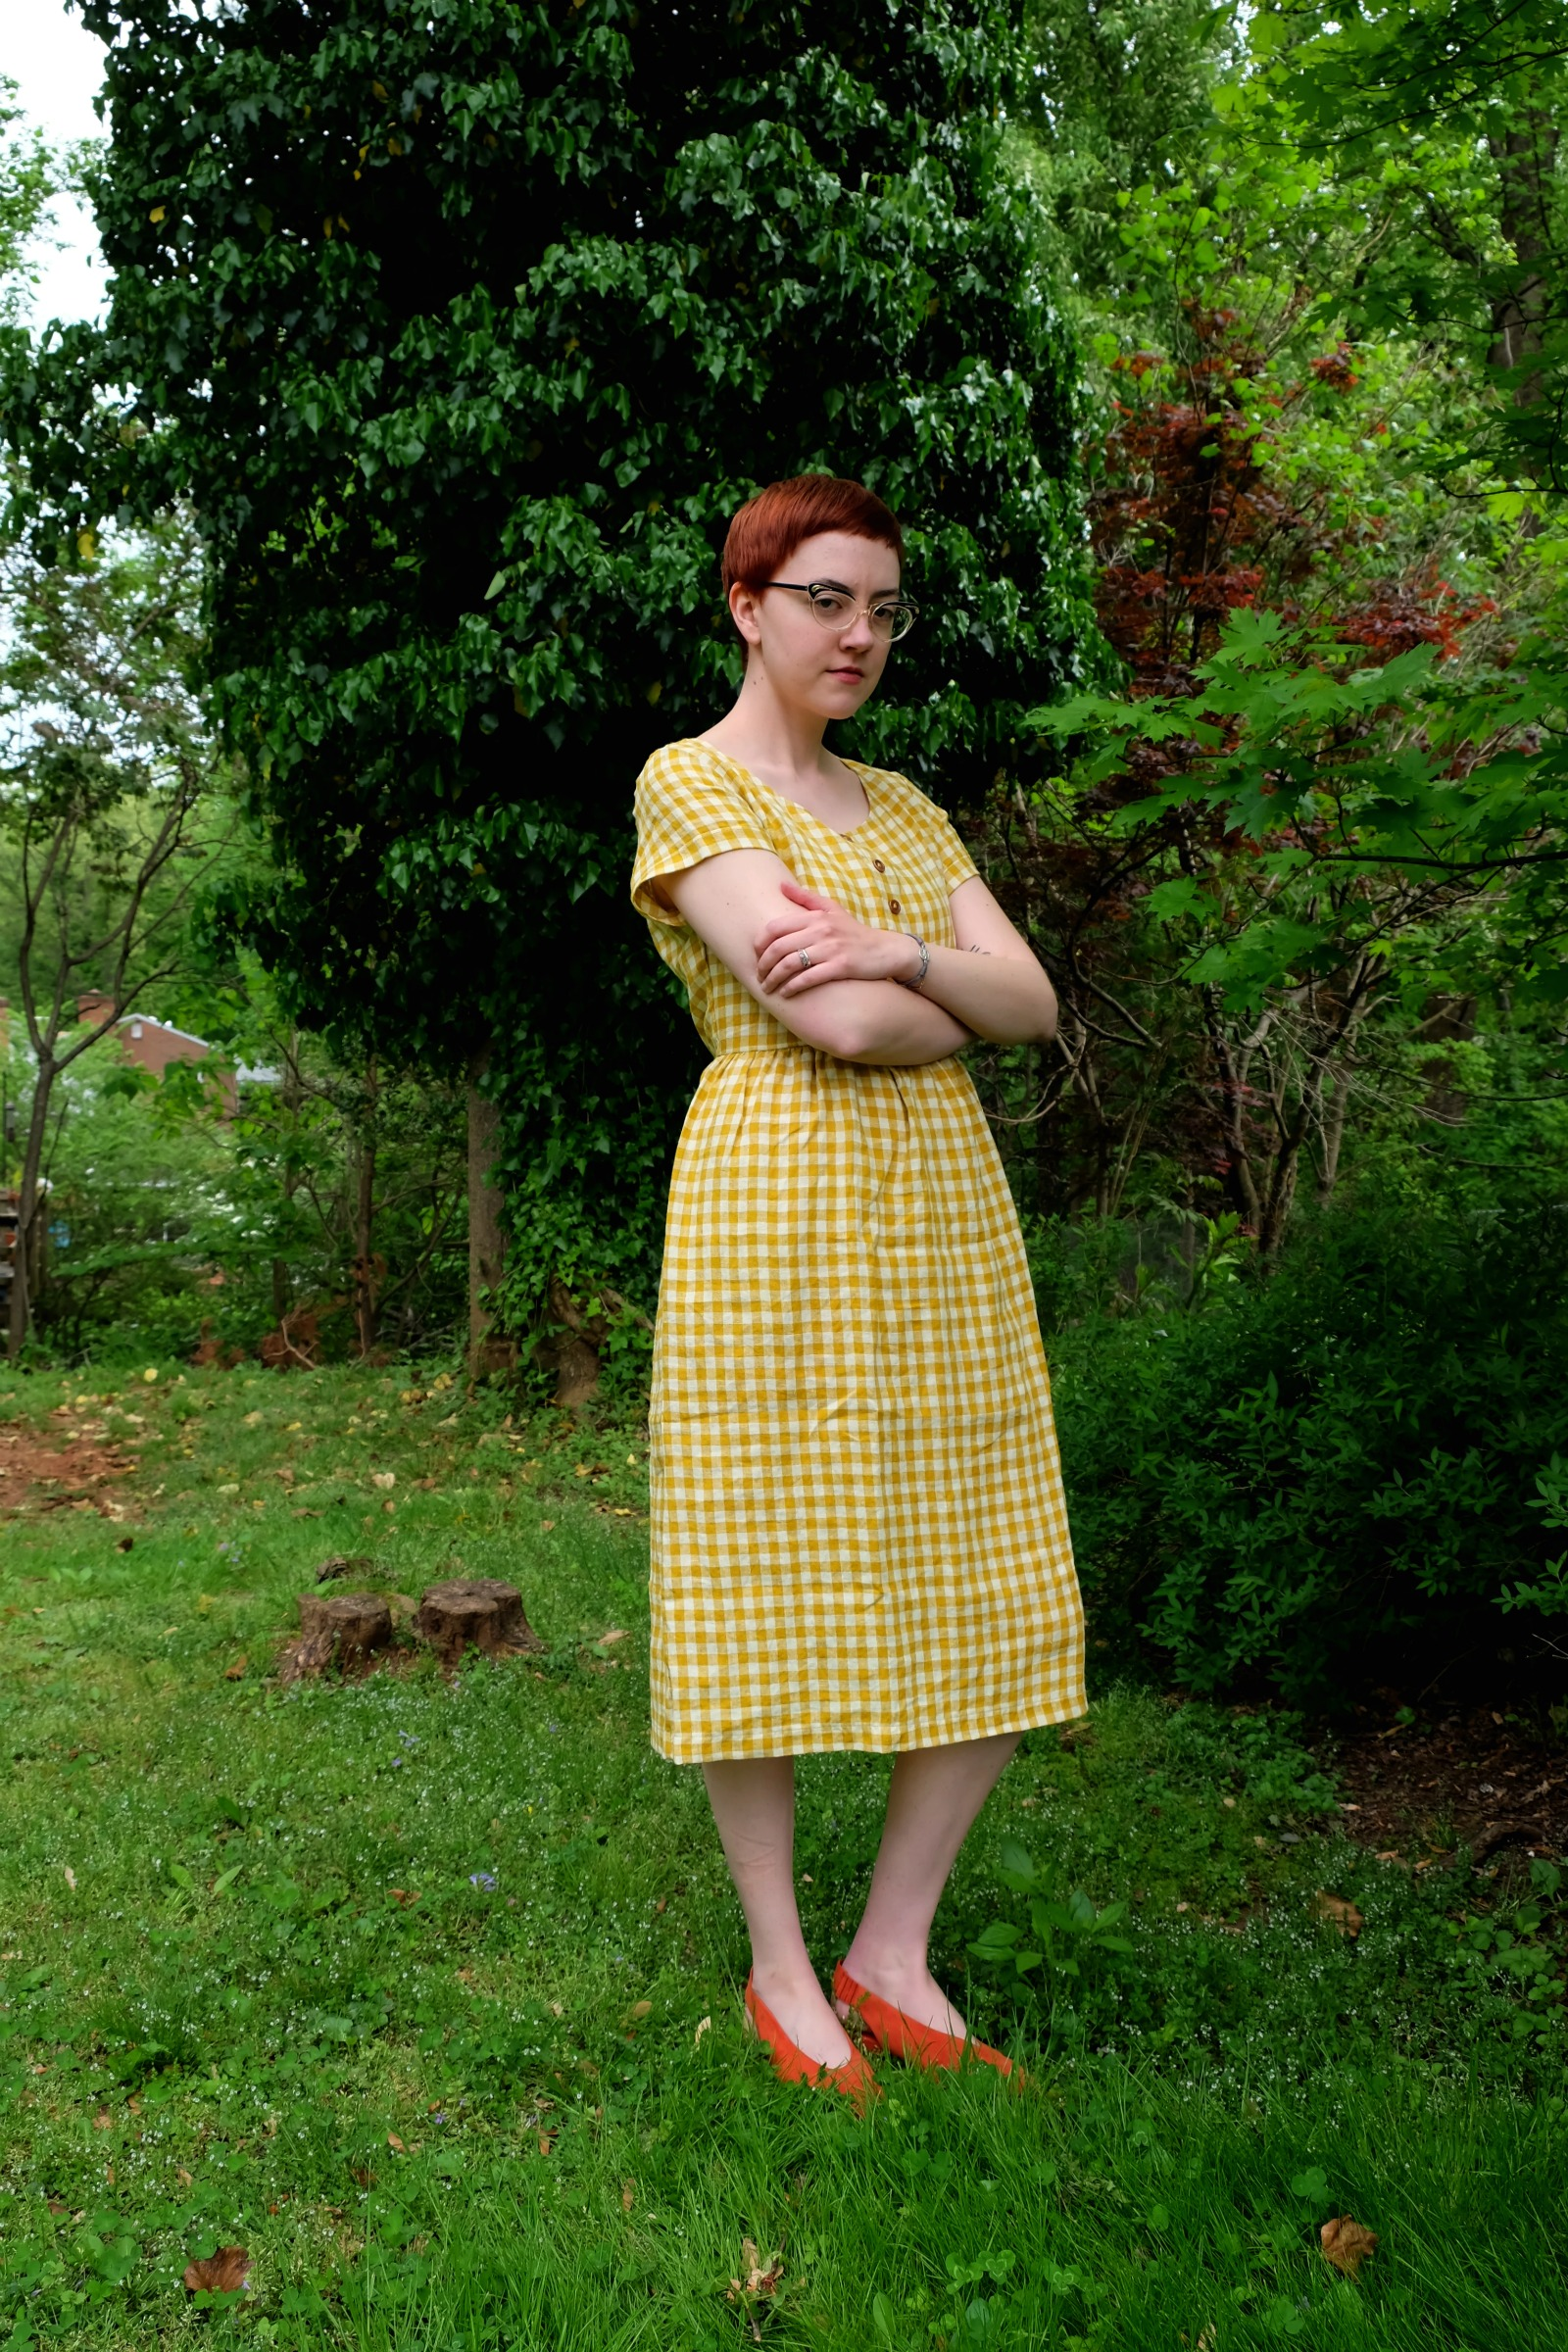 Ethical Details: Dress -  Pyne & Smith Clothiers ; Shoes -  Everlane ; Glasses - Retrospecced